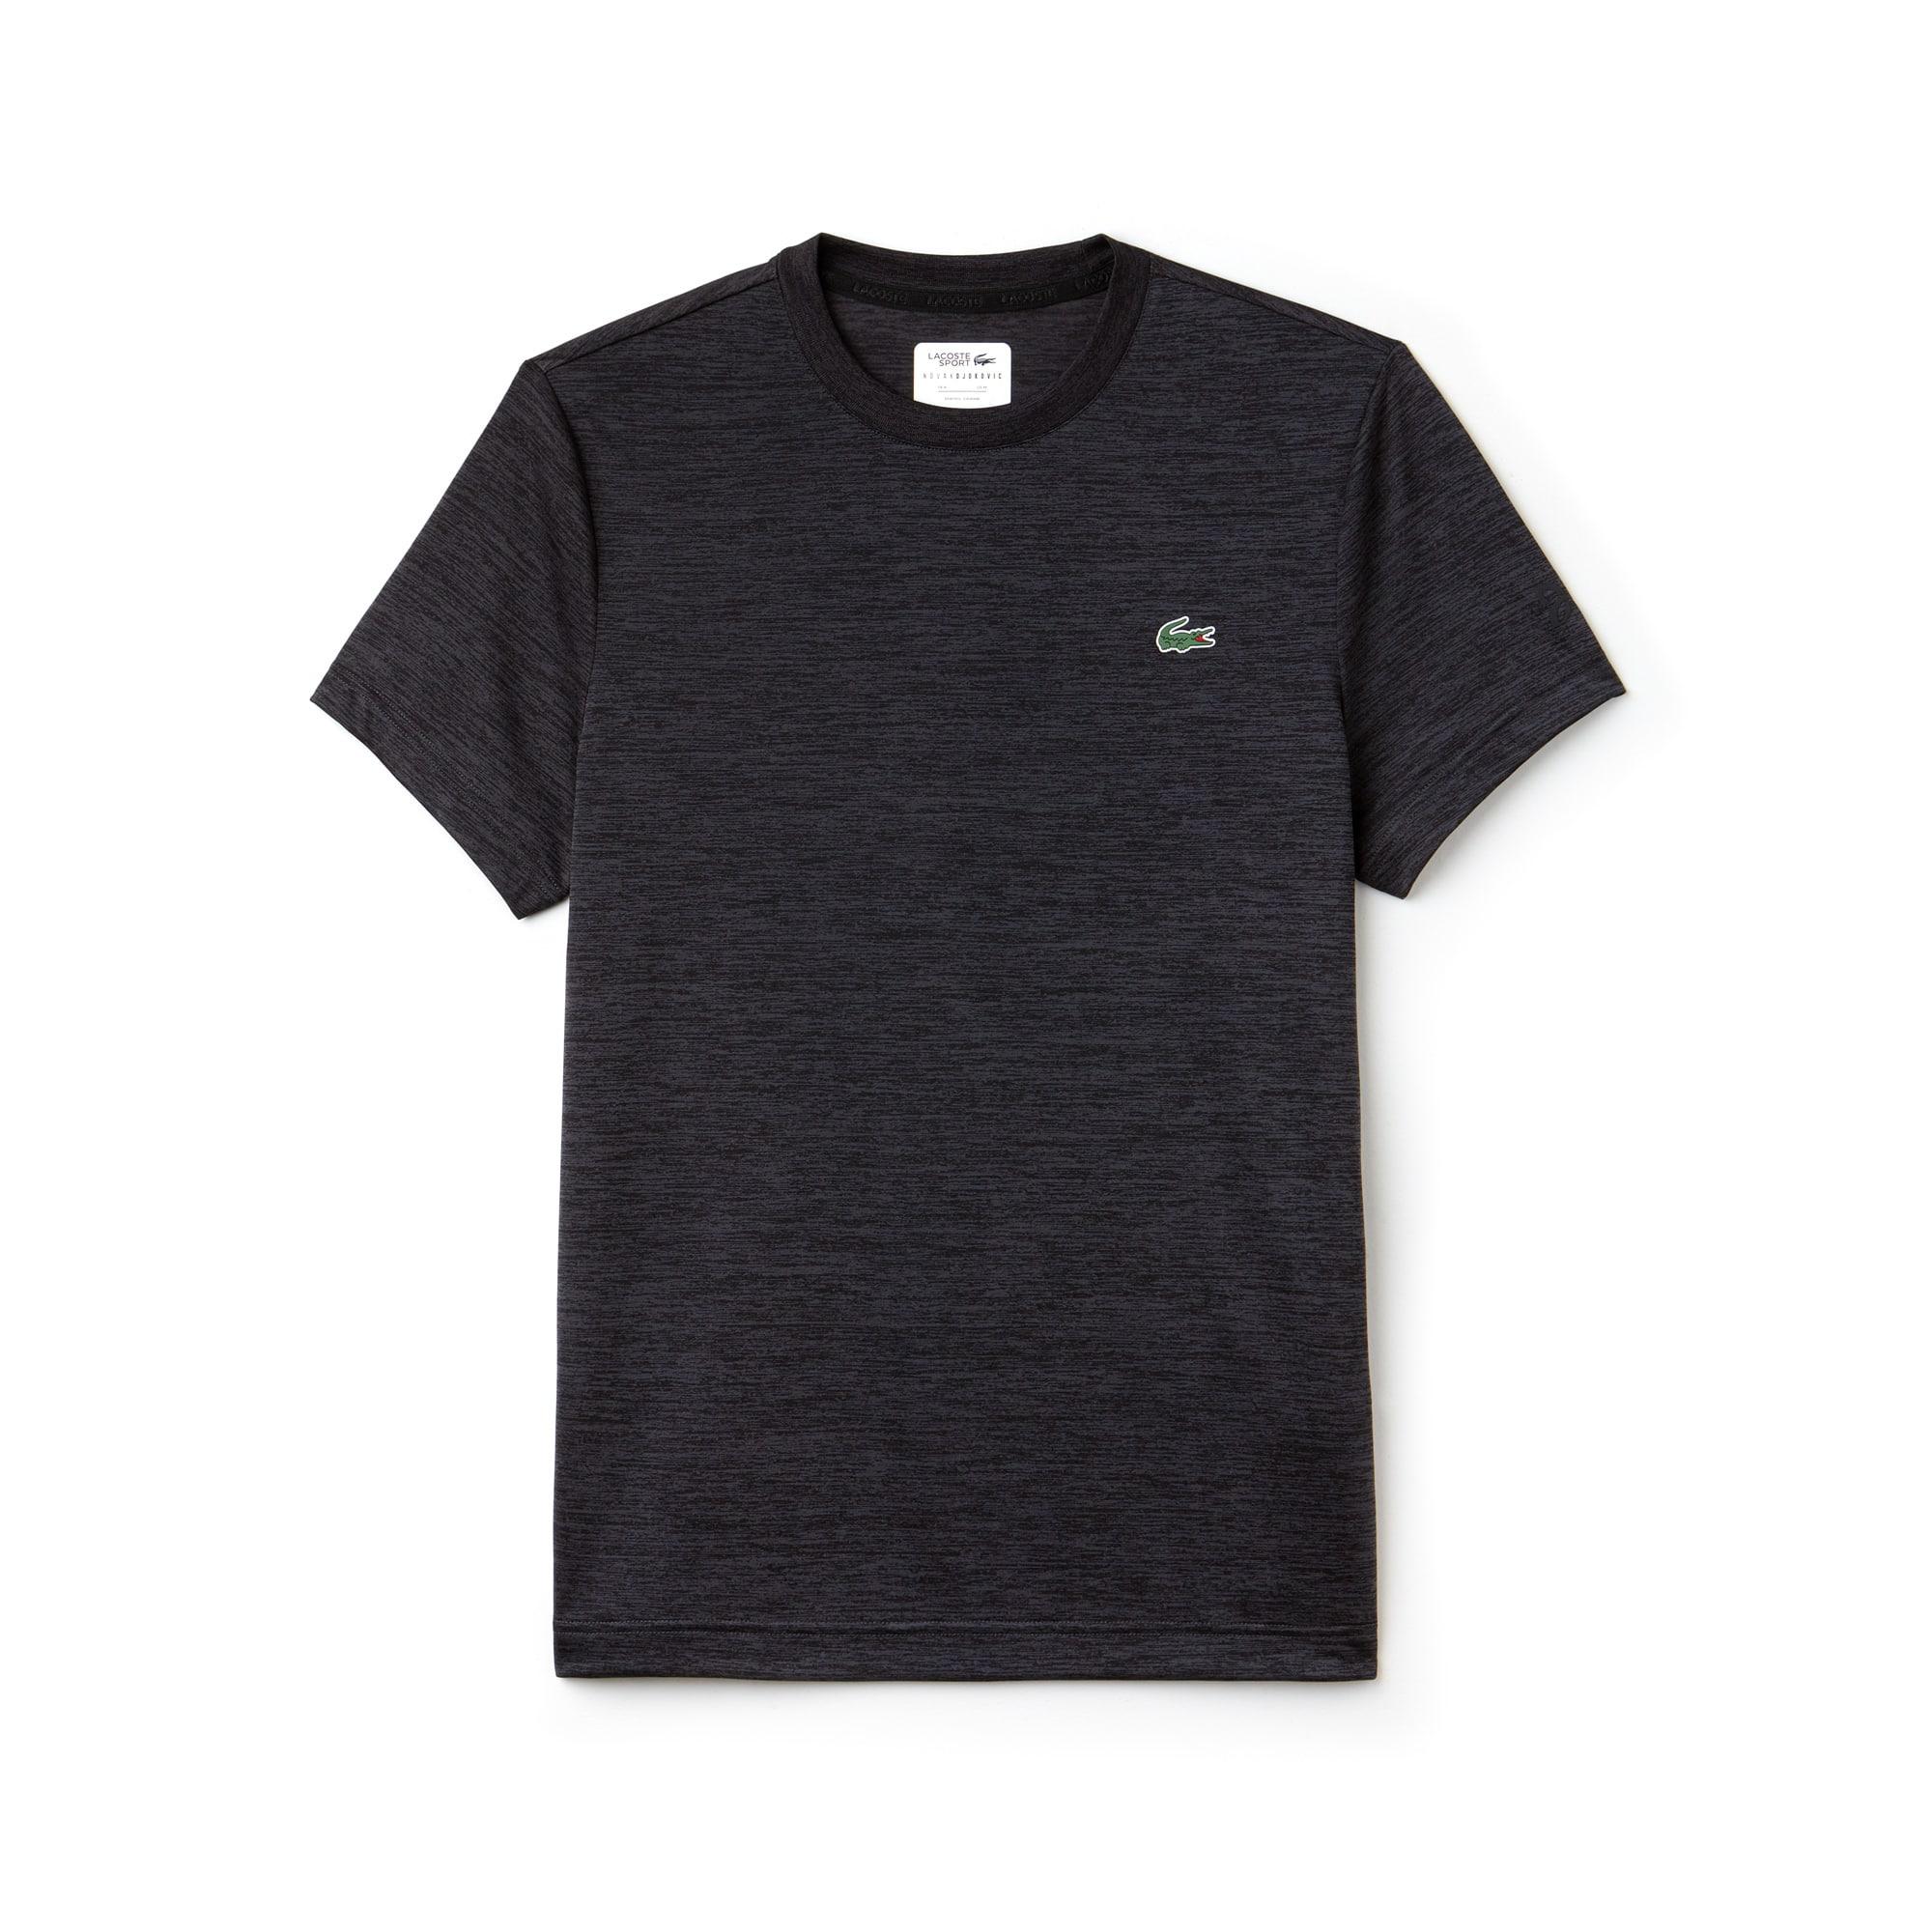 T-shirt decote redondo Tennis Lacoste SPORT em jersey técnico e mesh